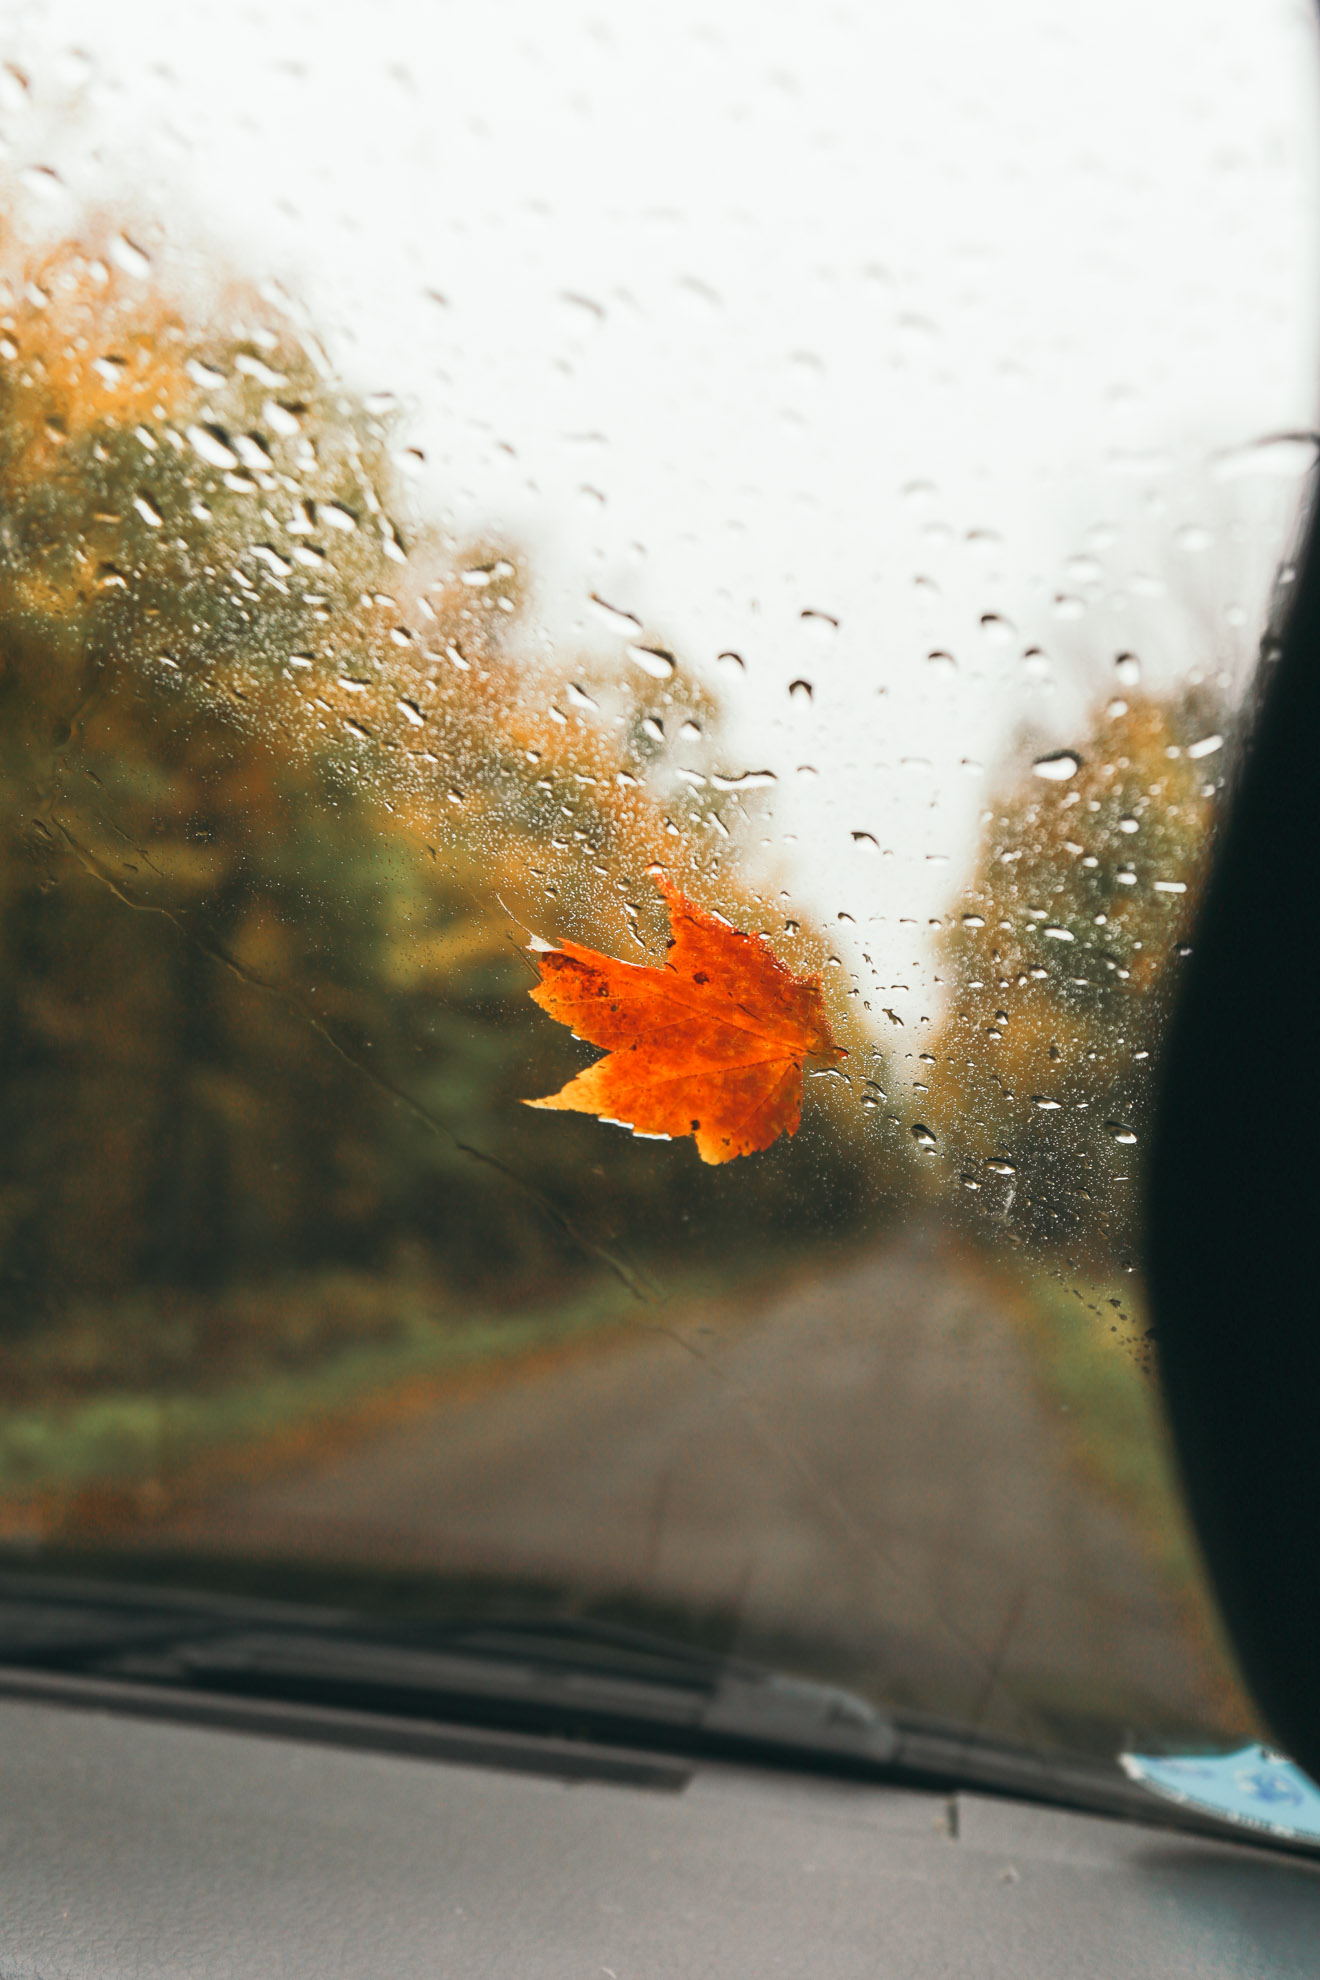 red orange leaf stuck in car window